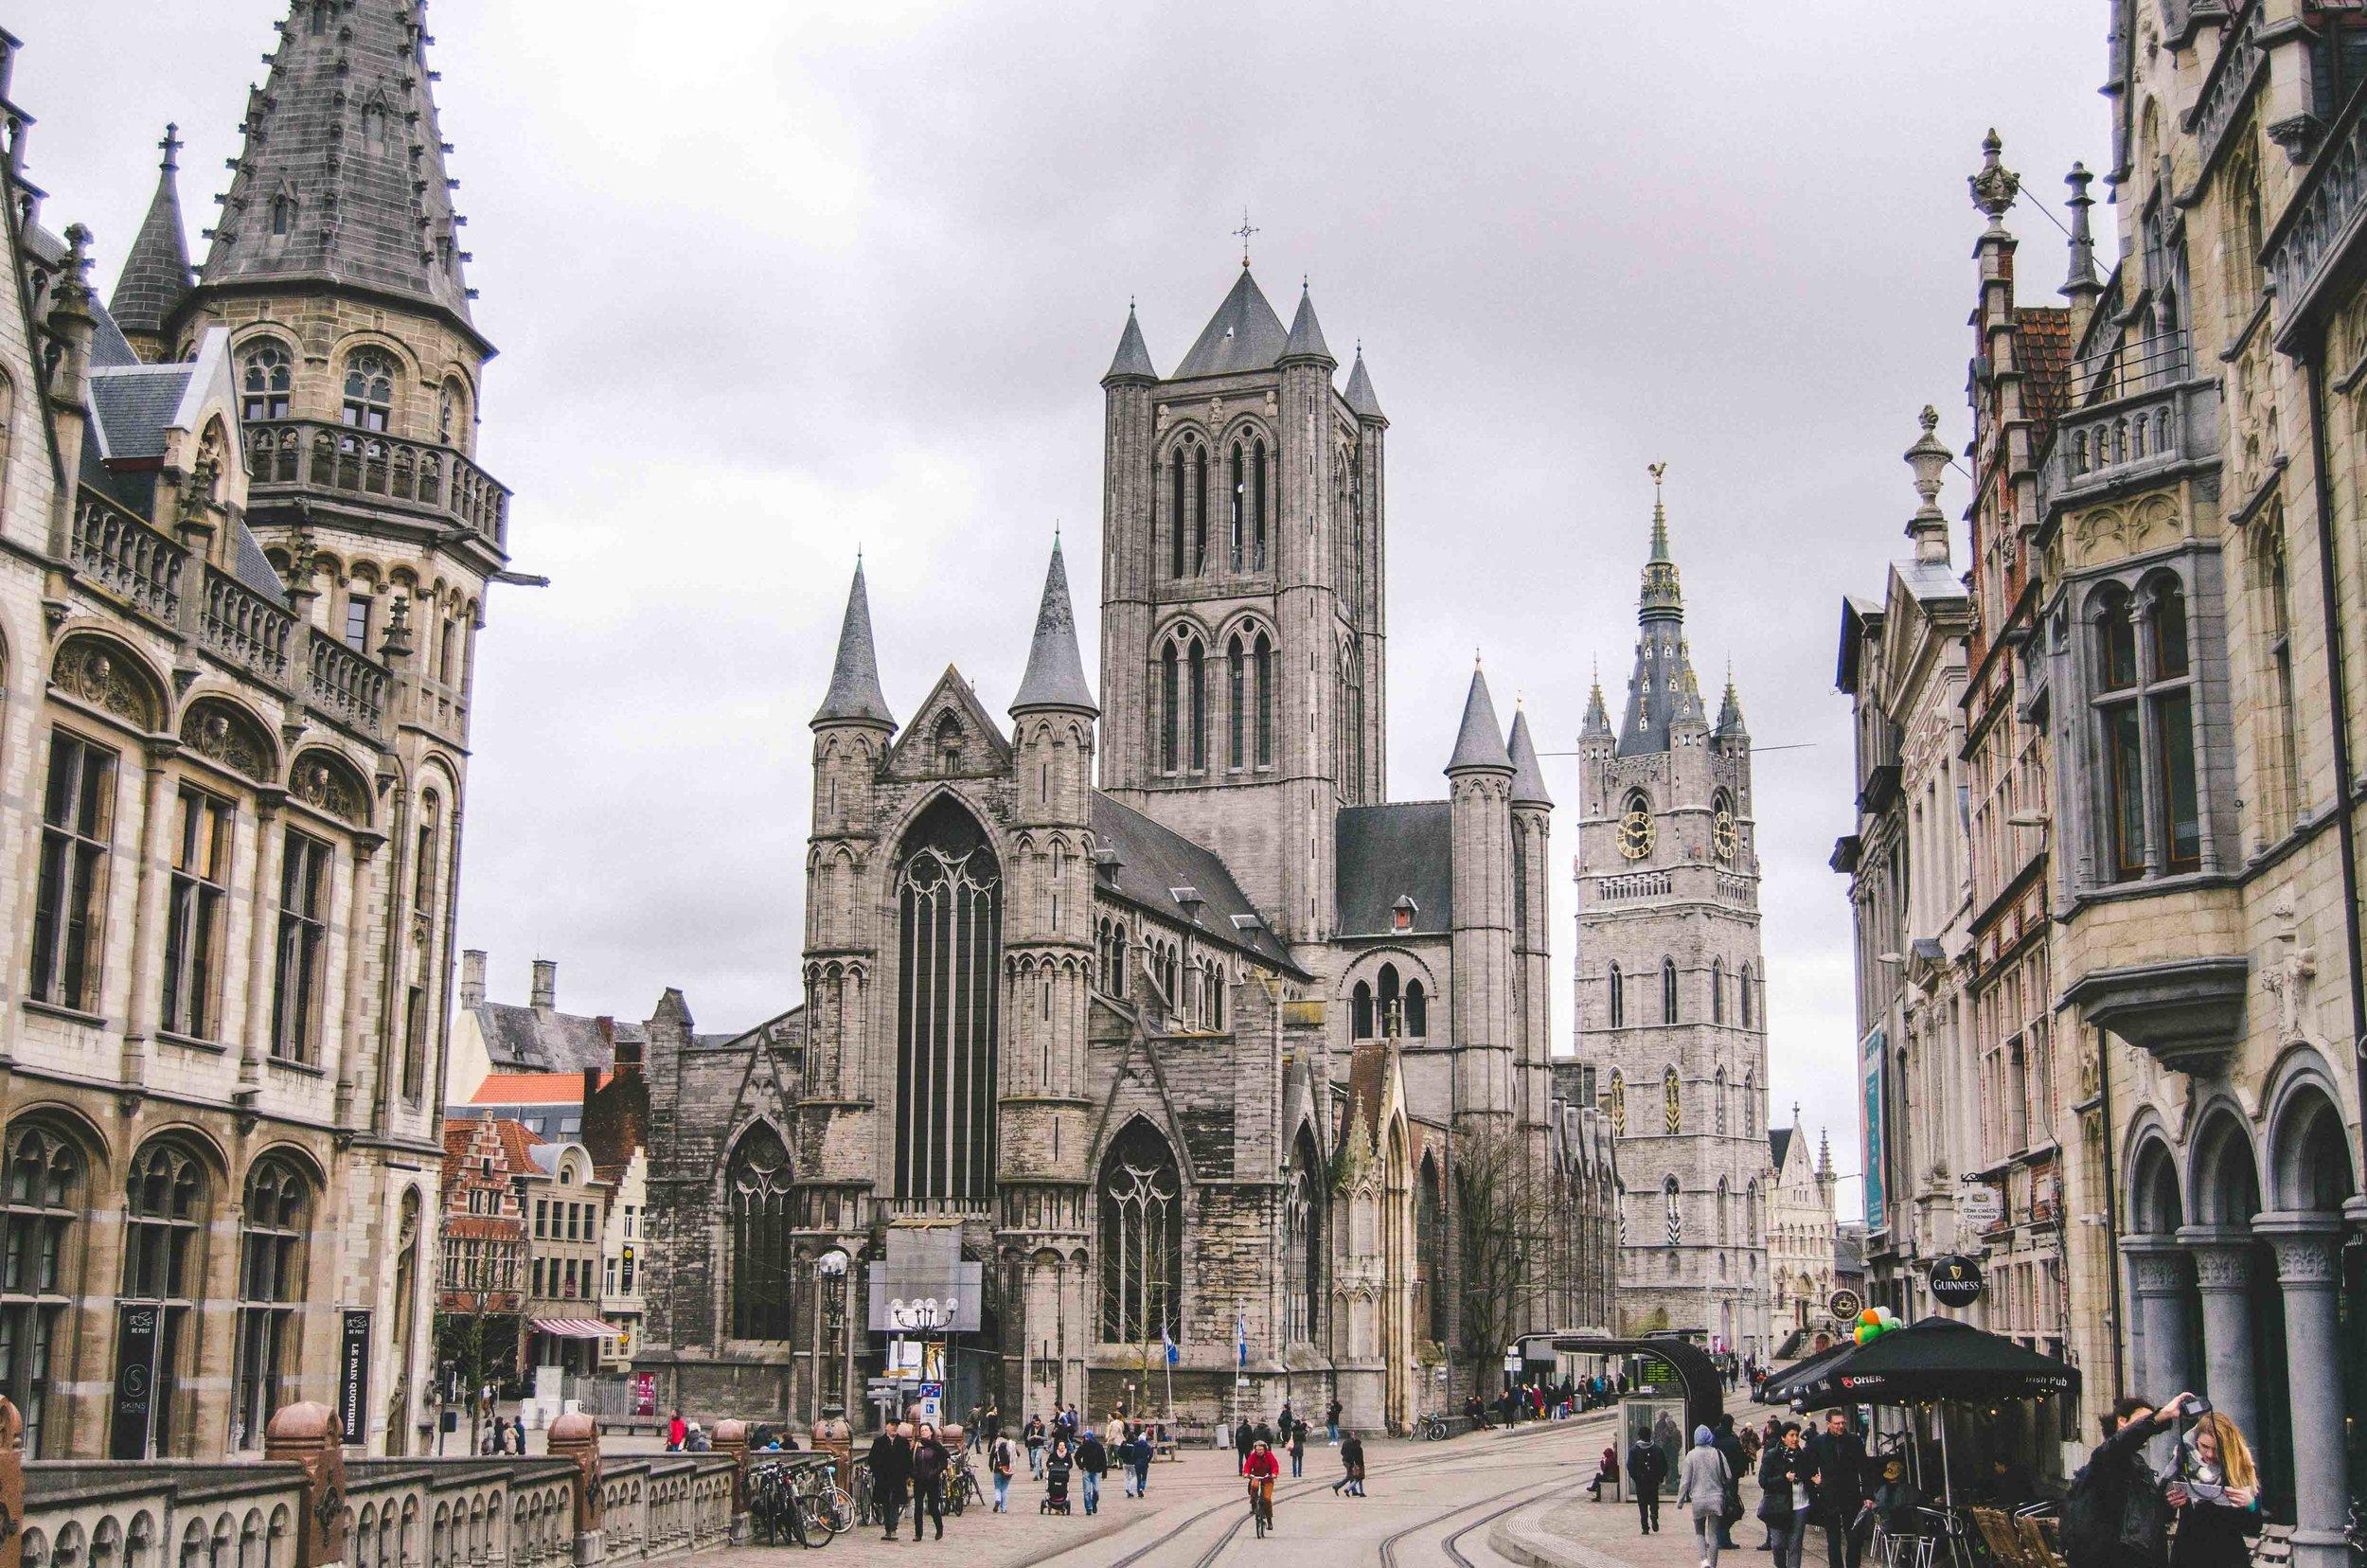 Saint Nicholas' Church / Sint-Niklaaskerk / with a major tram and bus intersection